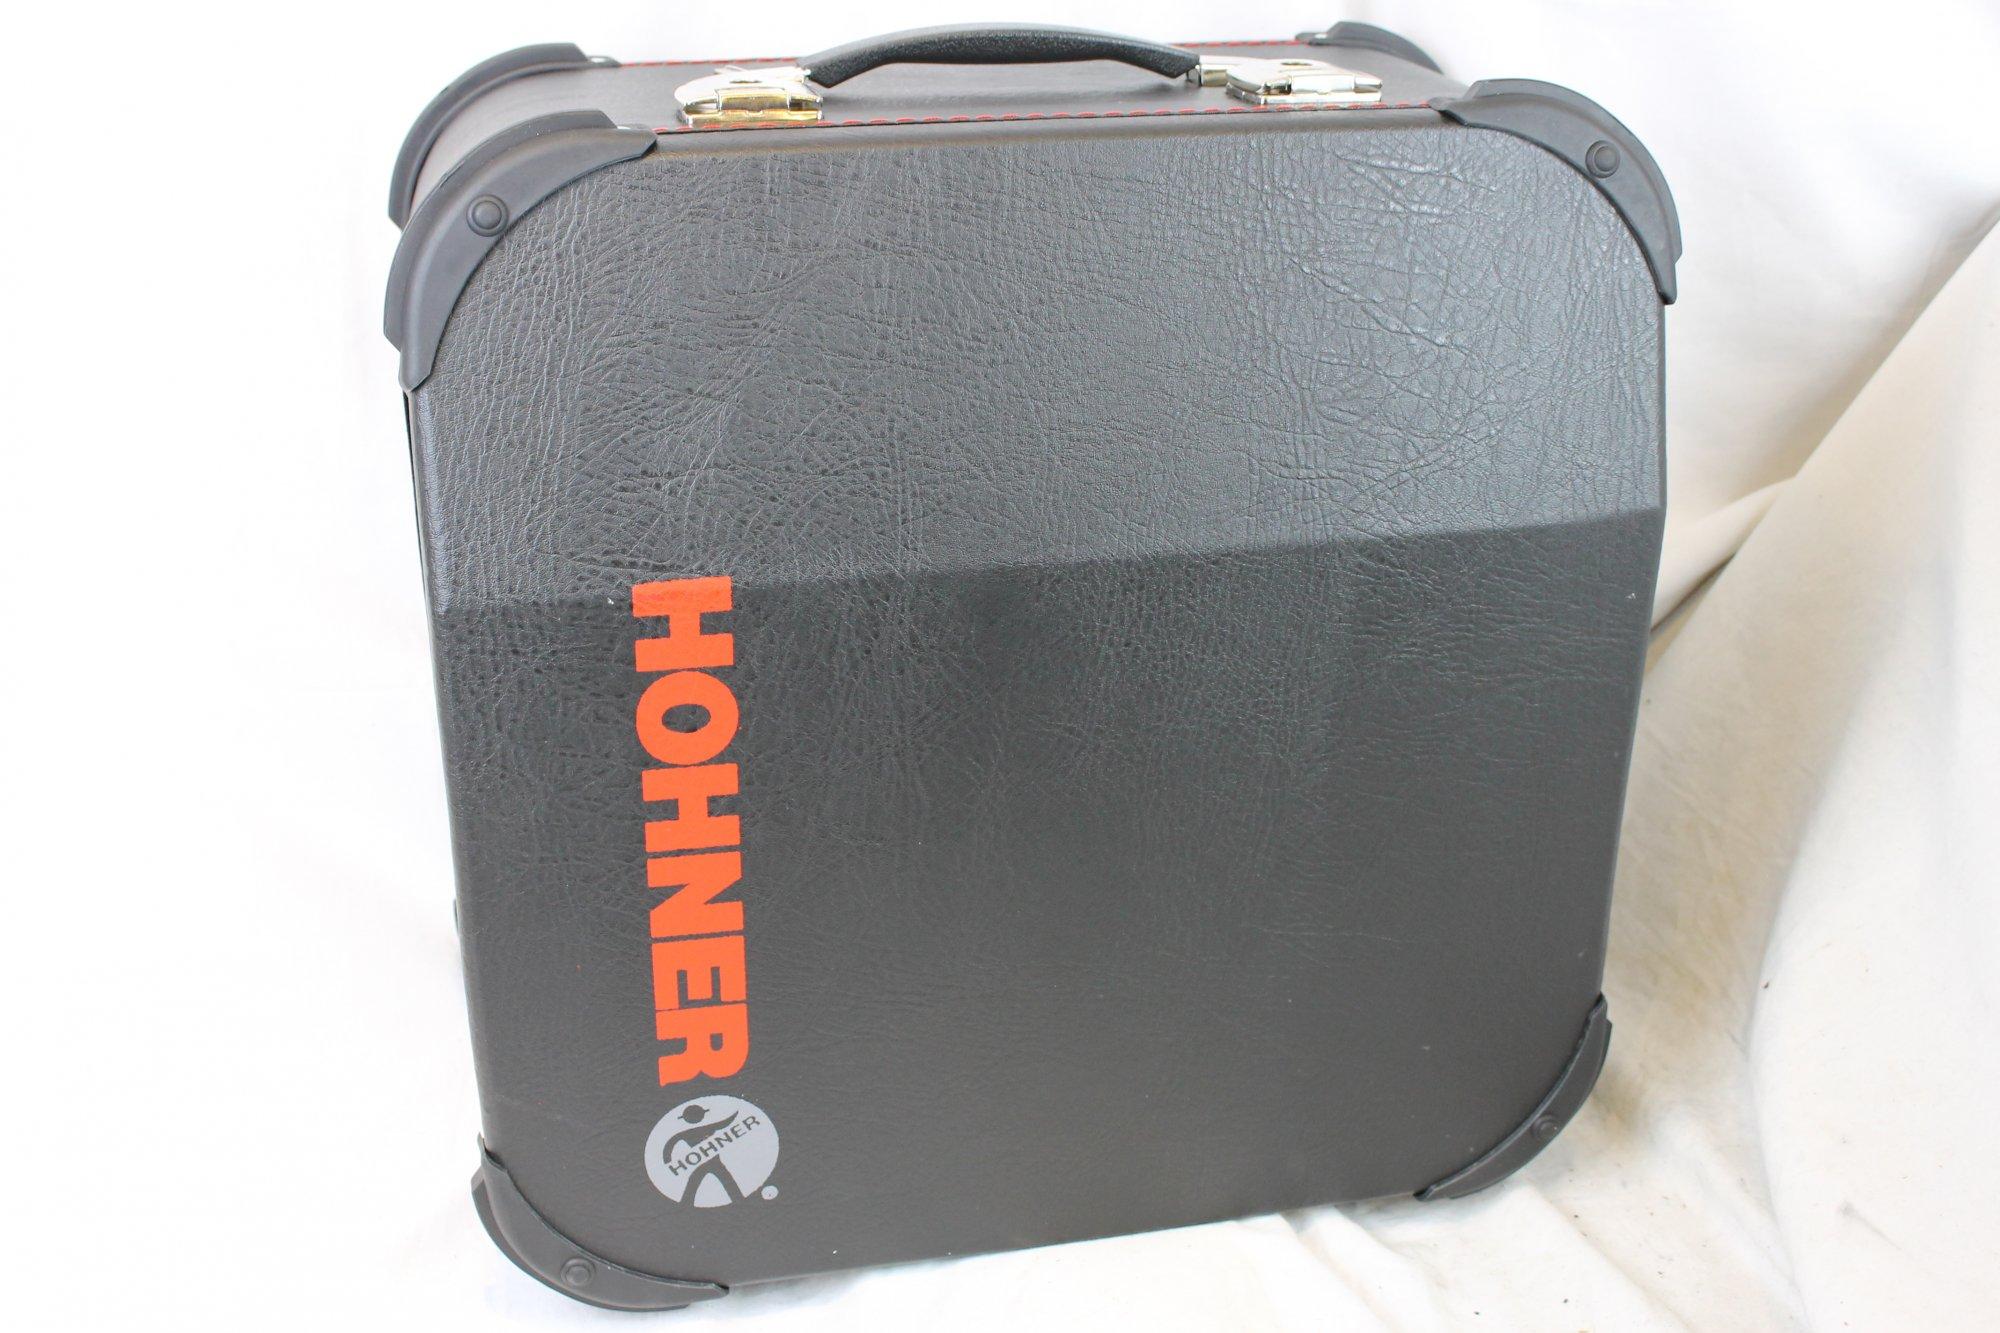 NEW Black Hohner Anacleto Diatonic Accordion Hard Case 16.5 x 16.5 x 9 (42cm x 42cm x 23cm) Fits Anacleto